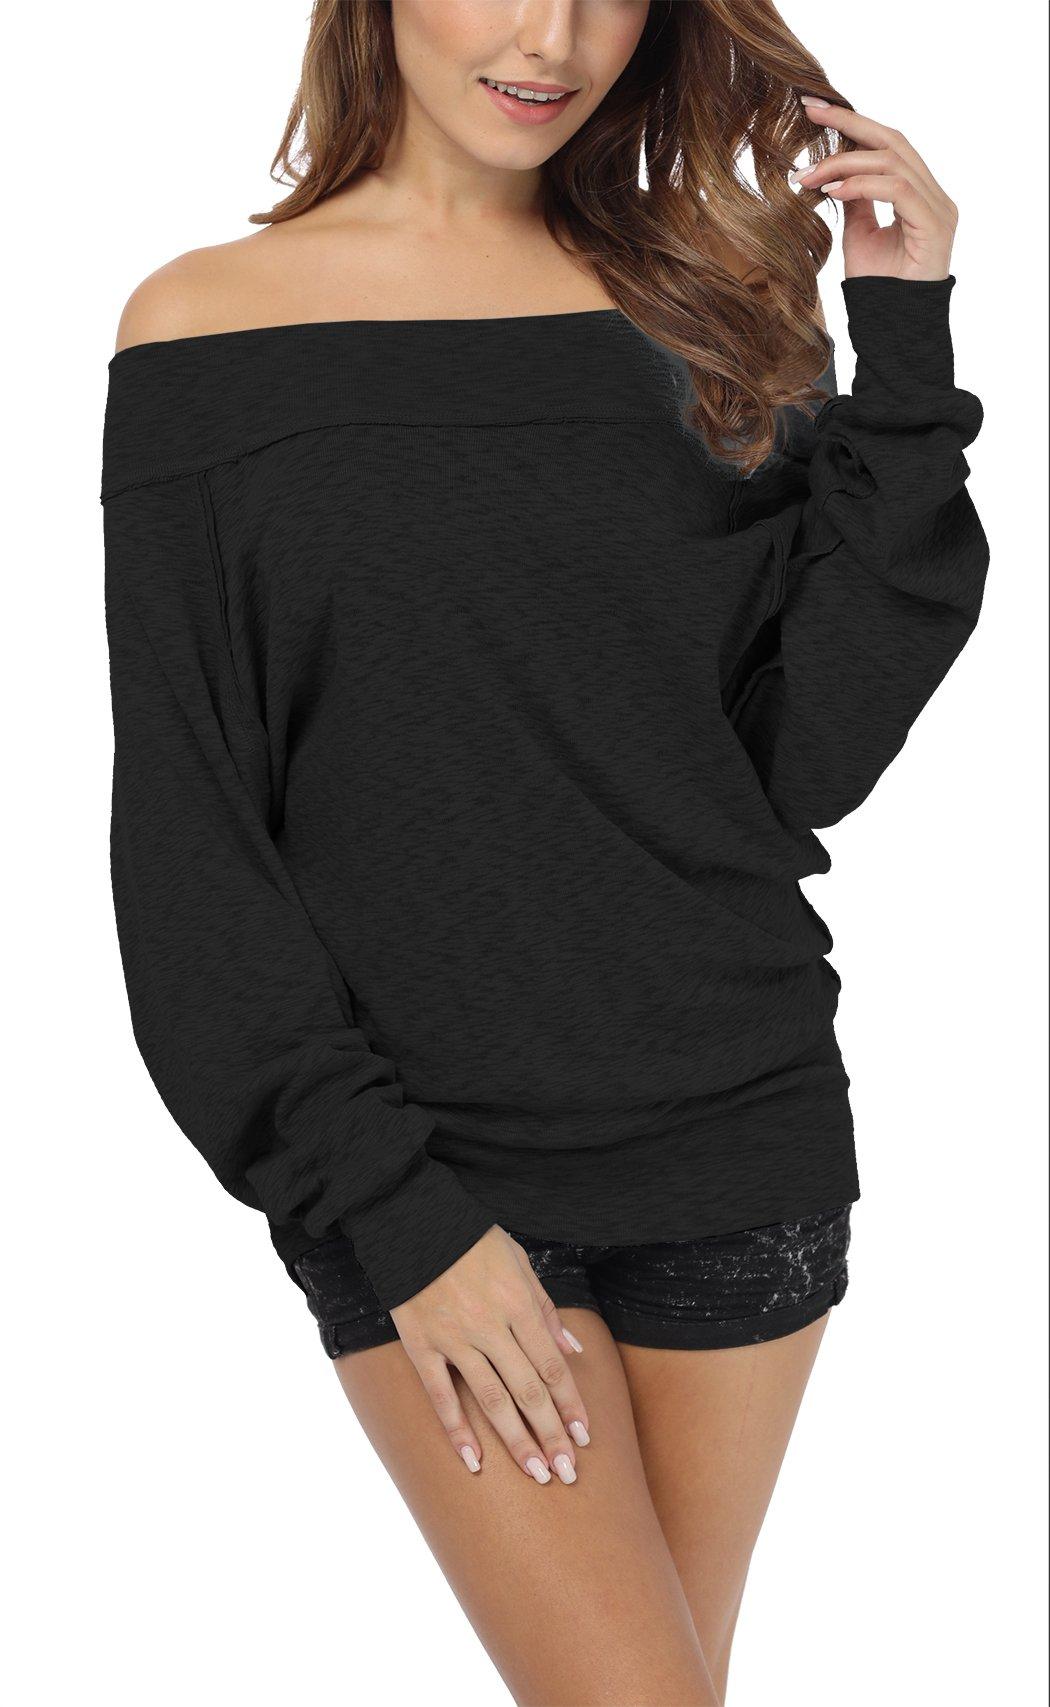 iGENJUN Women's Dolman Sleeve Off The Shoulder Sweater Shirt Tops,Black,M by iGENJUN (Image #2)